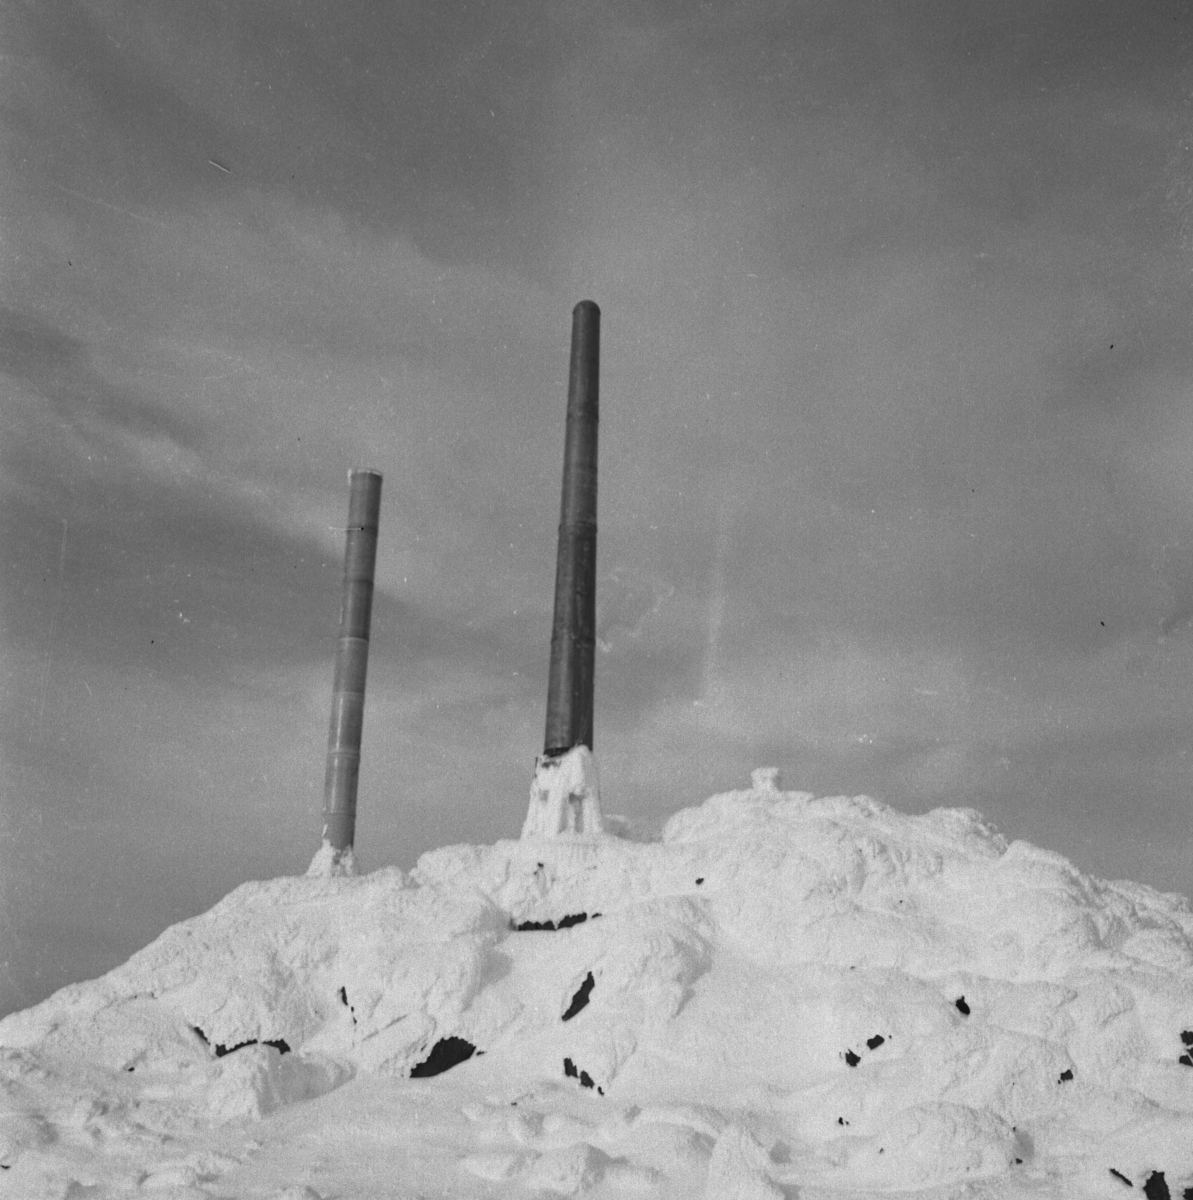 Tynset, Tronfjell, Radiosender, Tårn, Vinter